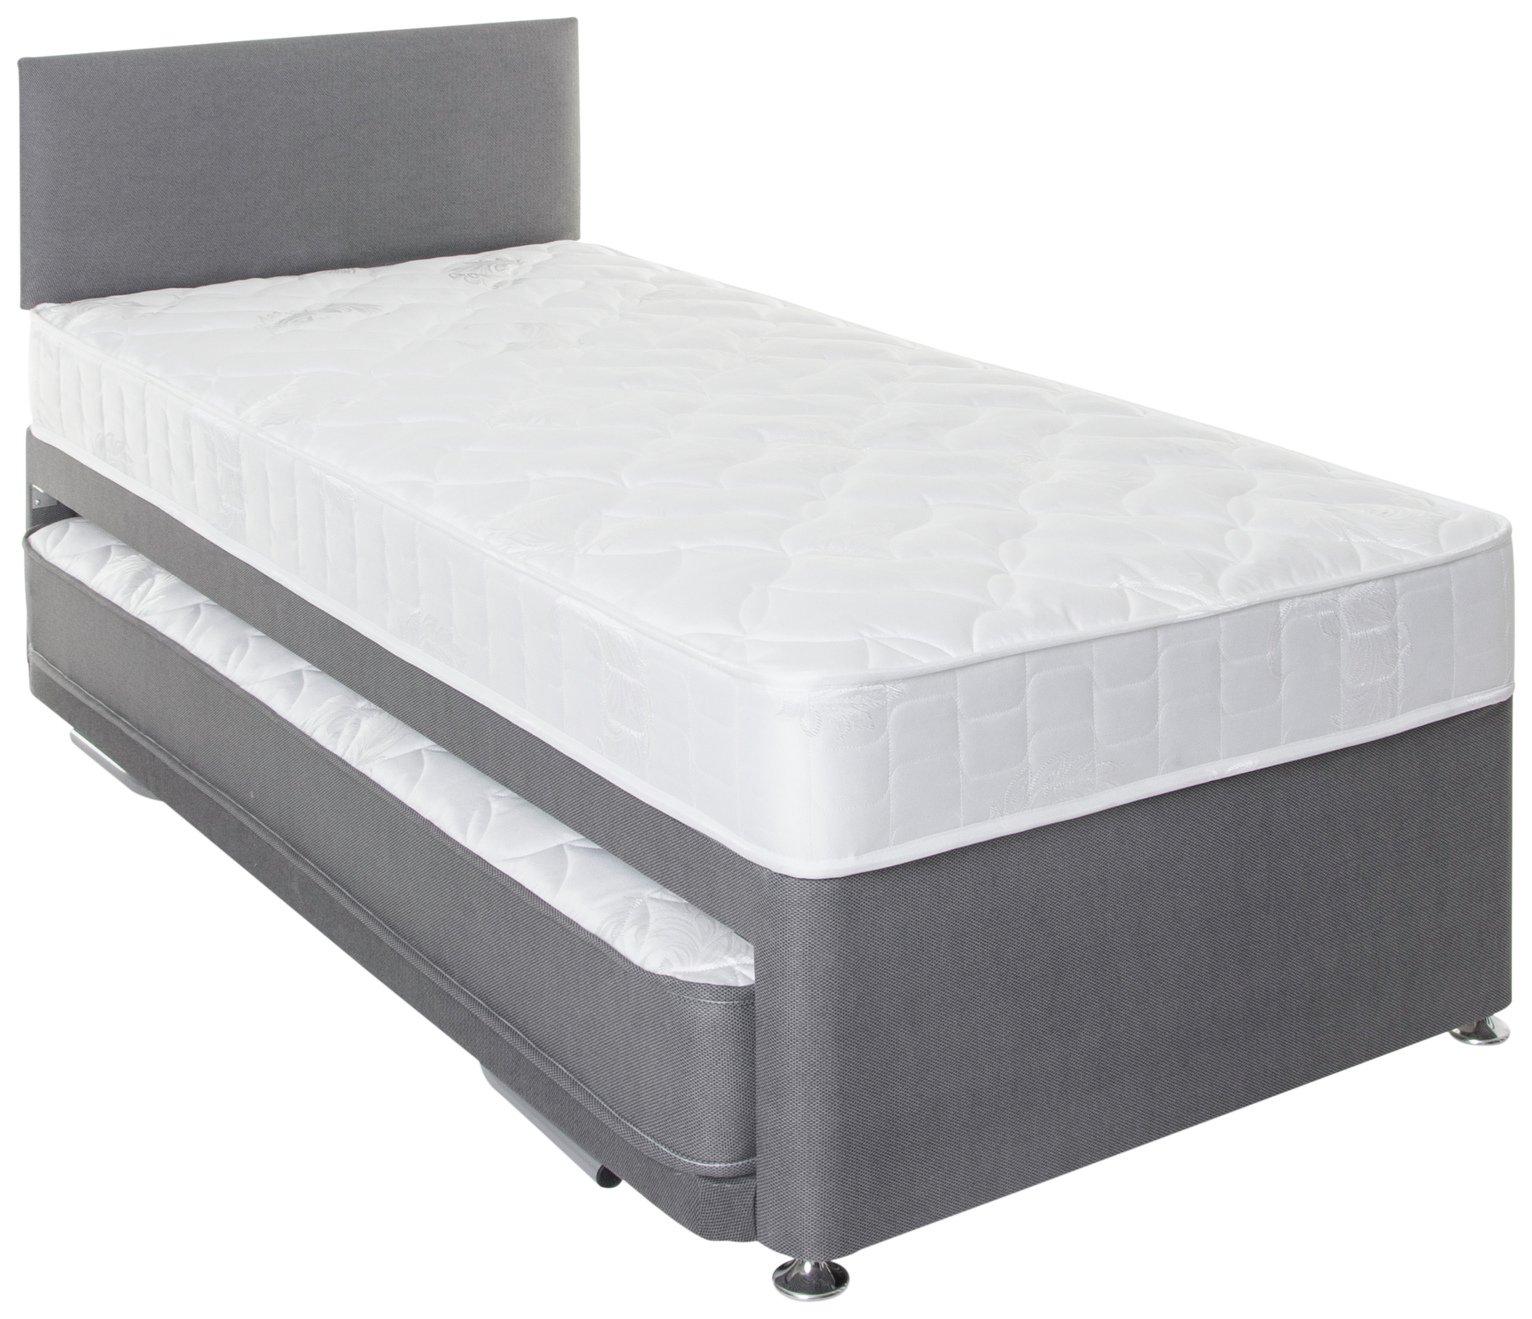 Image of Airsprung Bertrum Trundle Guest Bed - Single